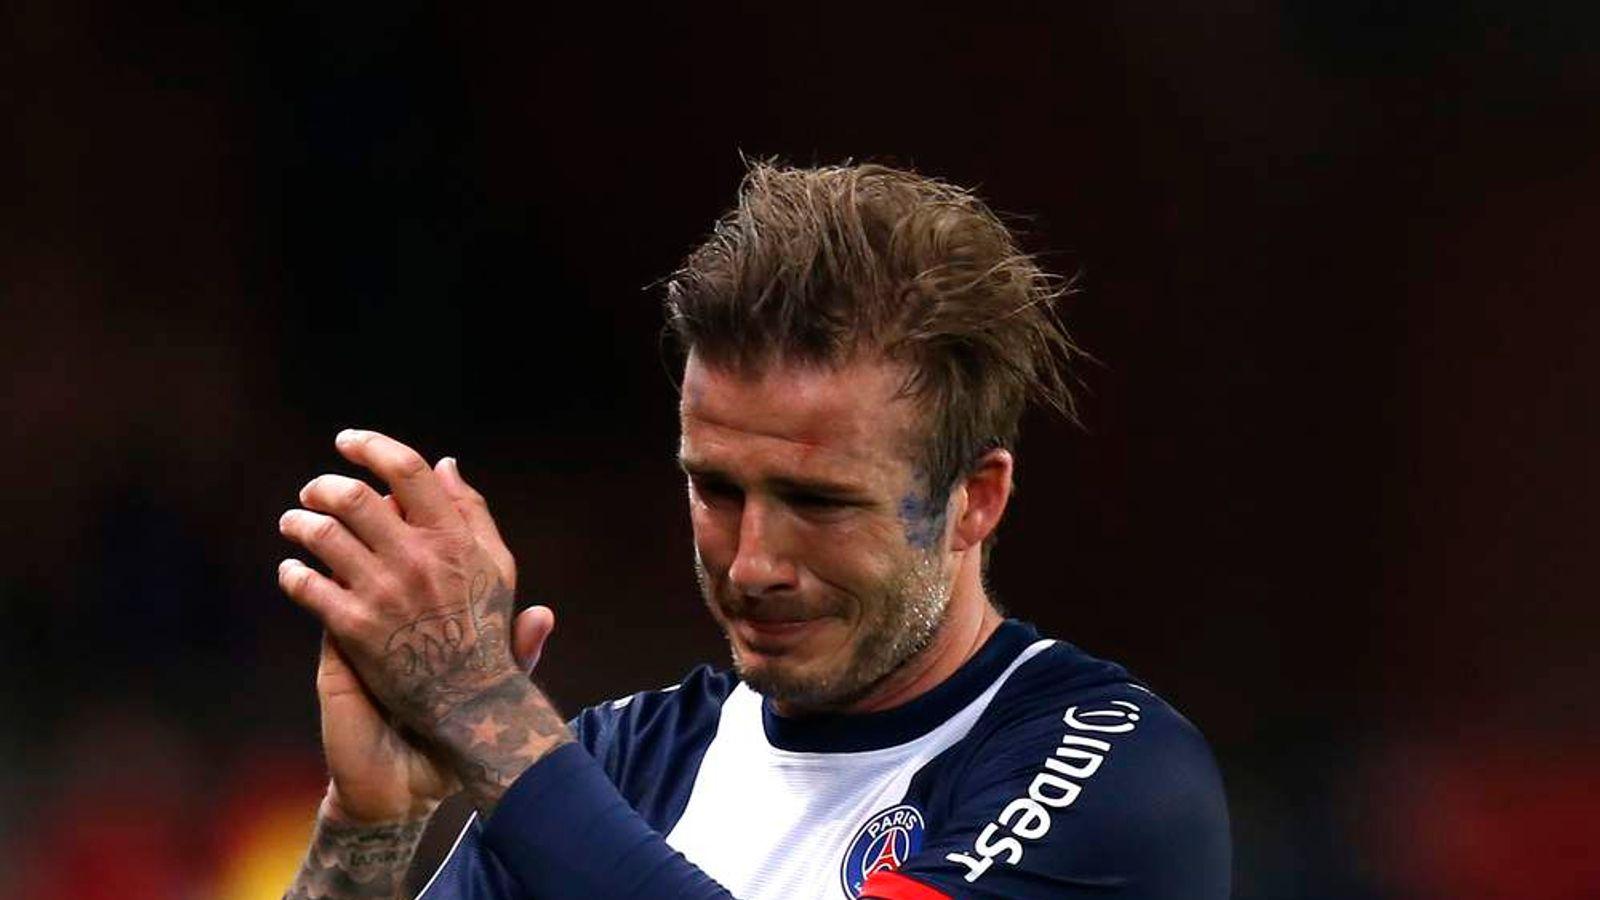 Paris Saint-Germain's Beckham reacts at the end of his team's French Ligue 1 soccer match against Brest at the Parc des Princes stadium in Paris